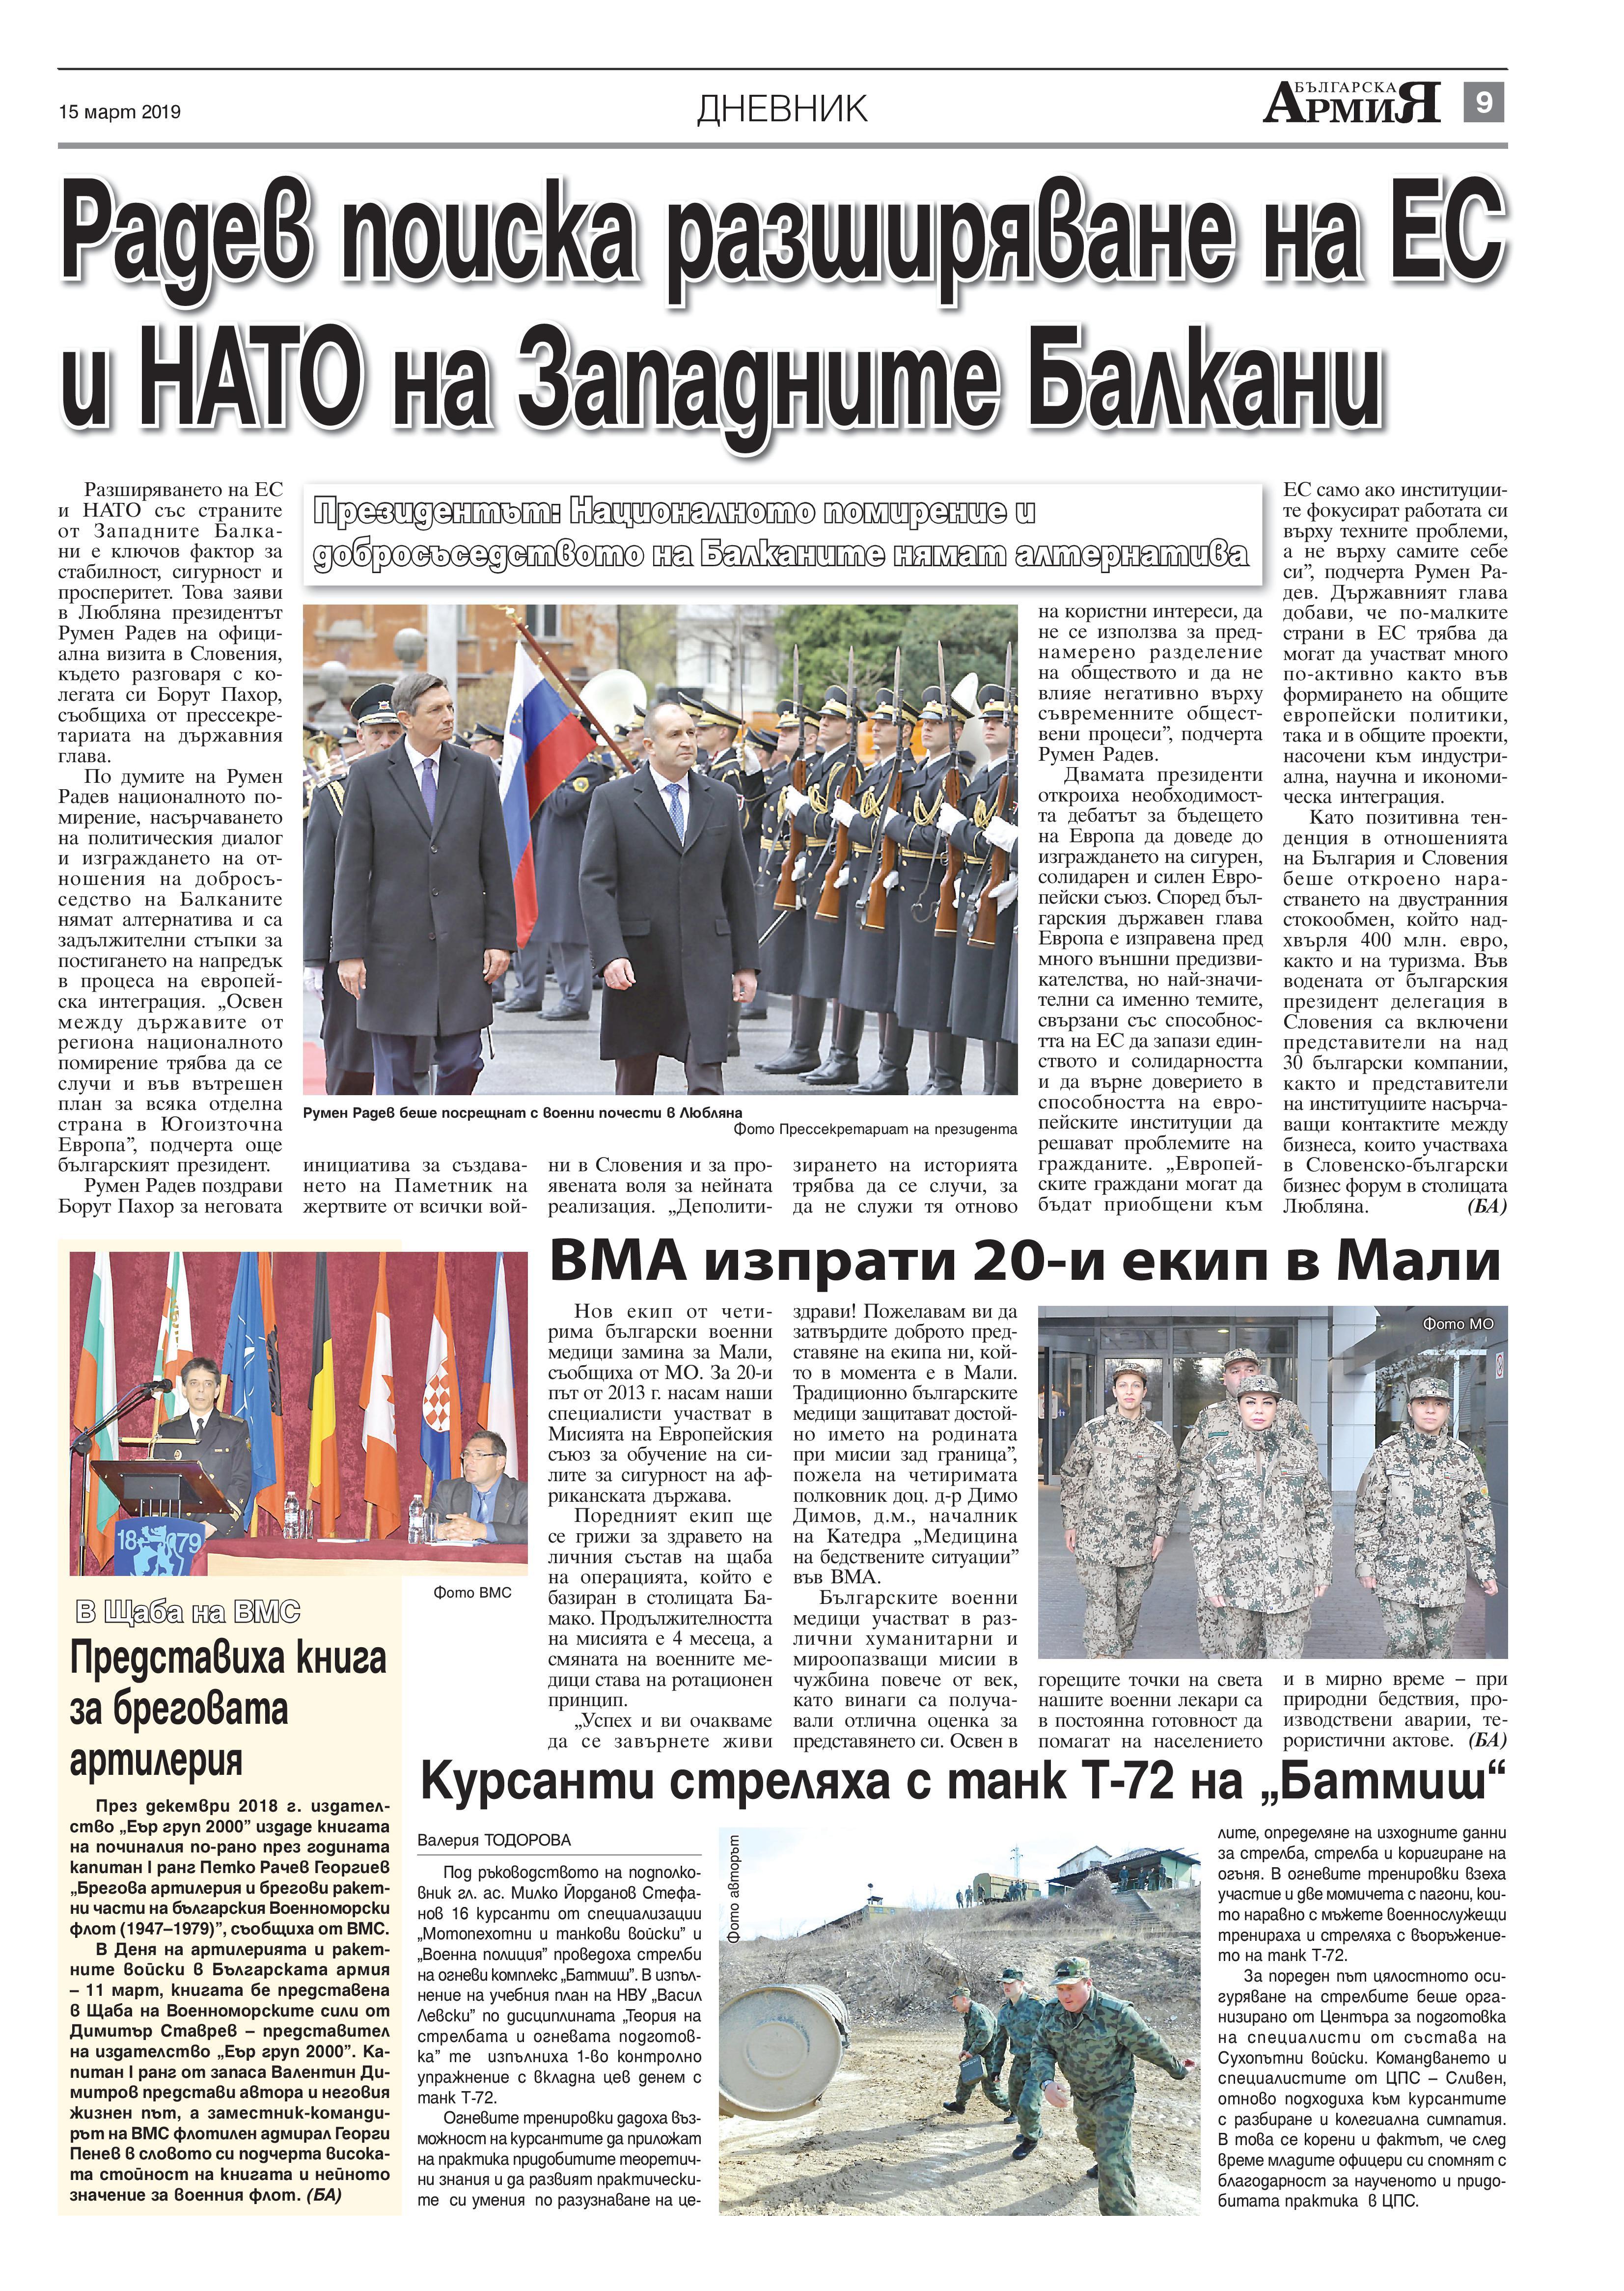 https://armymedia.bg/wp-content/uploads/2015/06/09-26.jpg